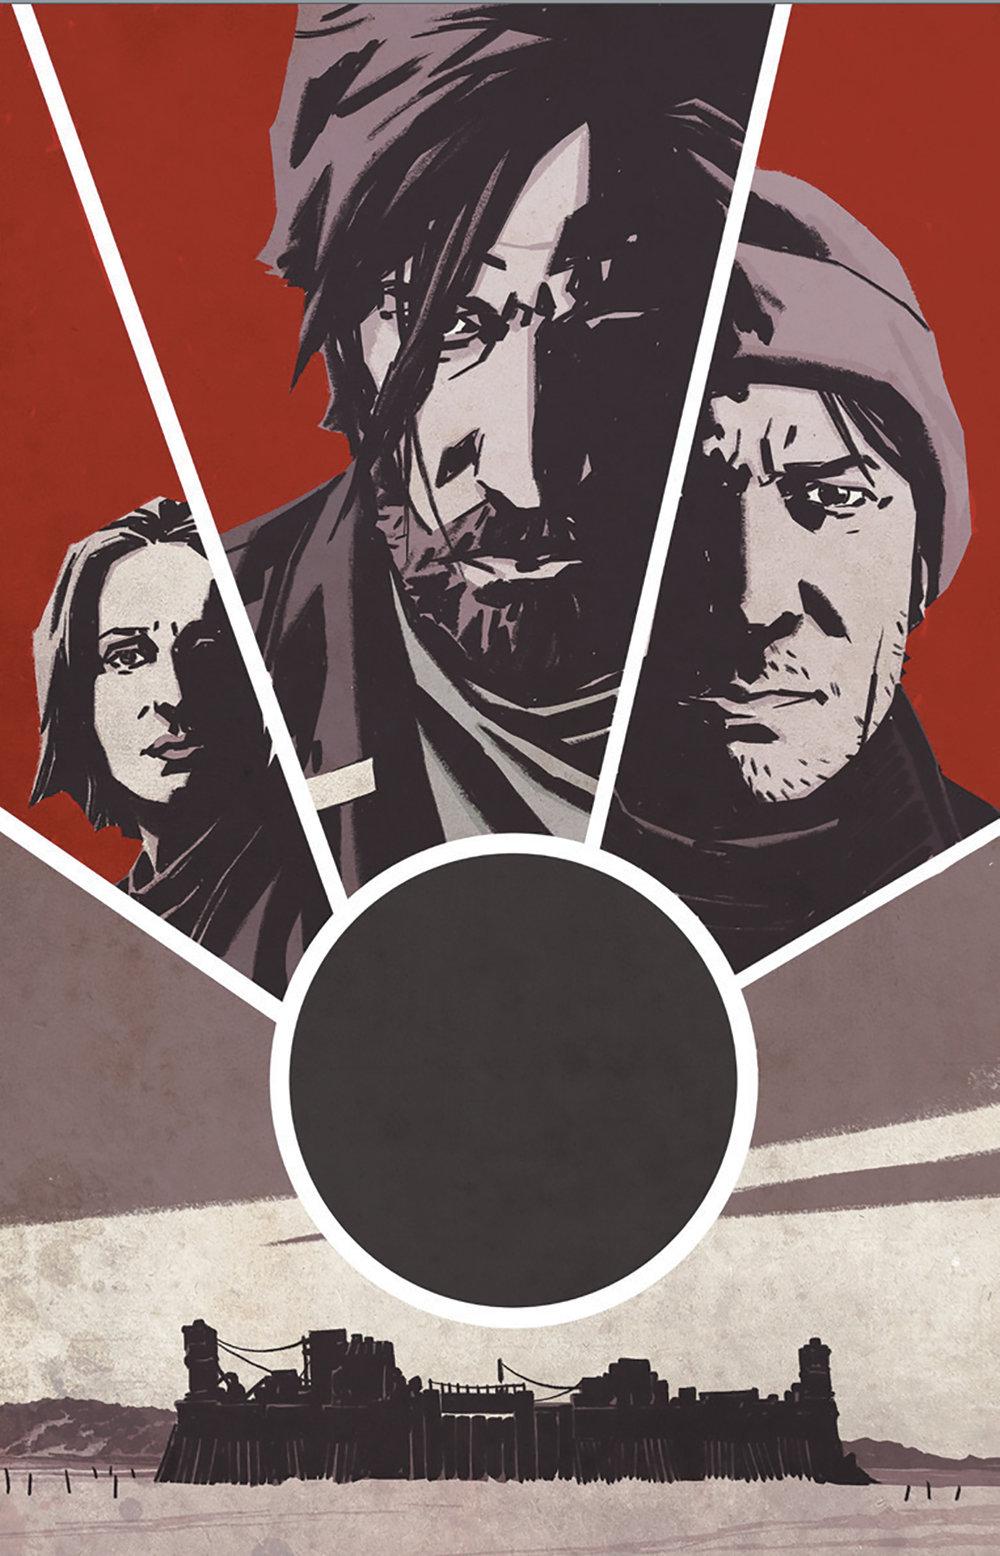 Dead Kings #4  is out 4/3/2019.